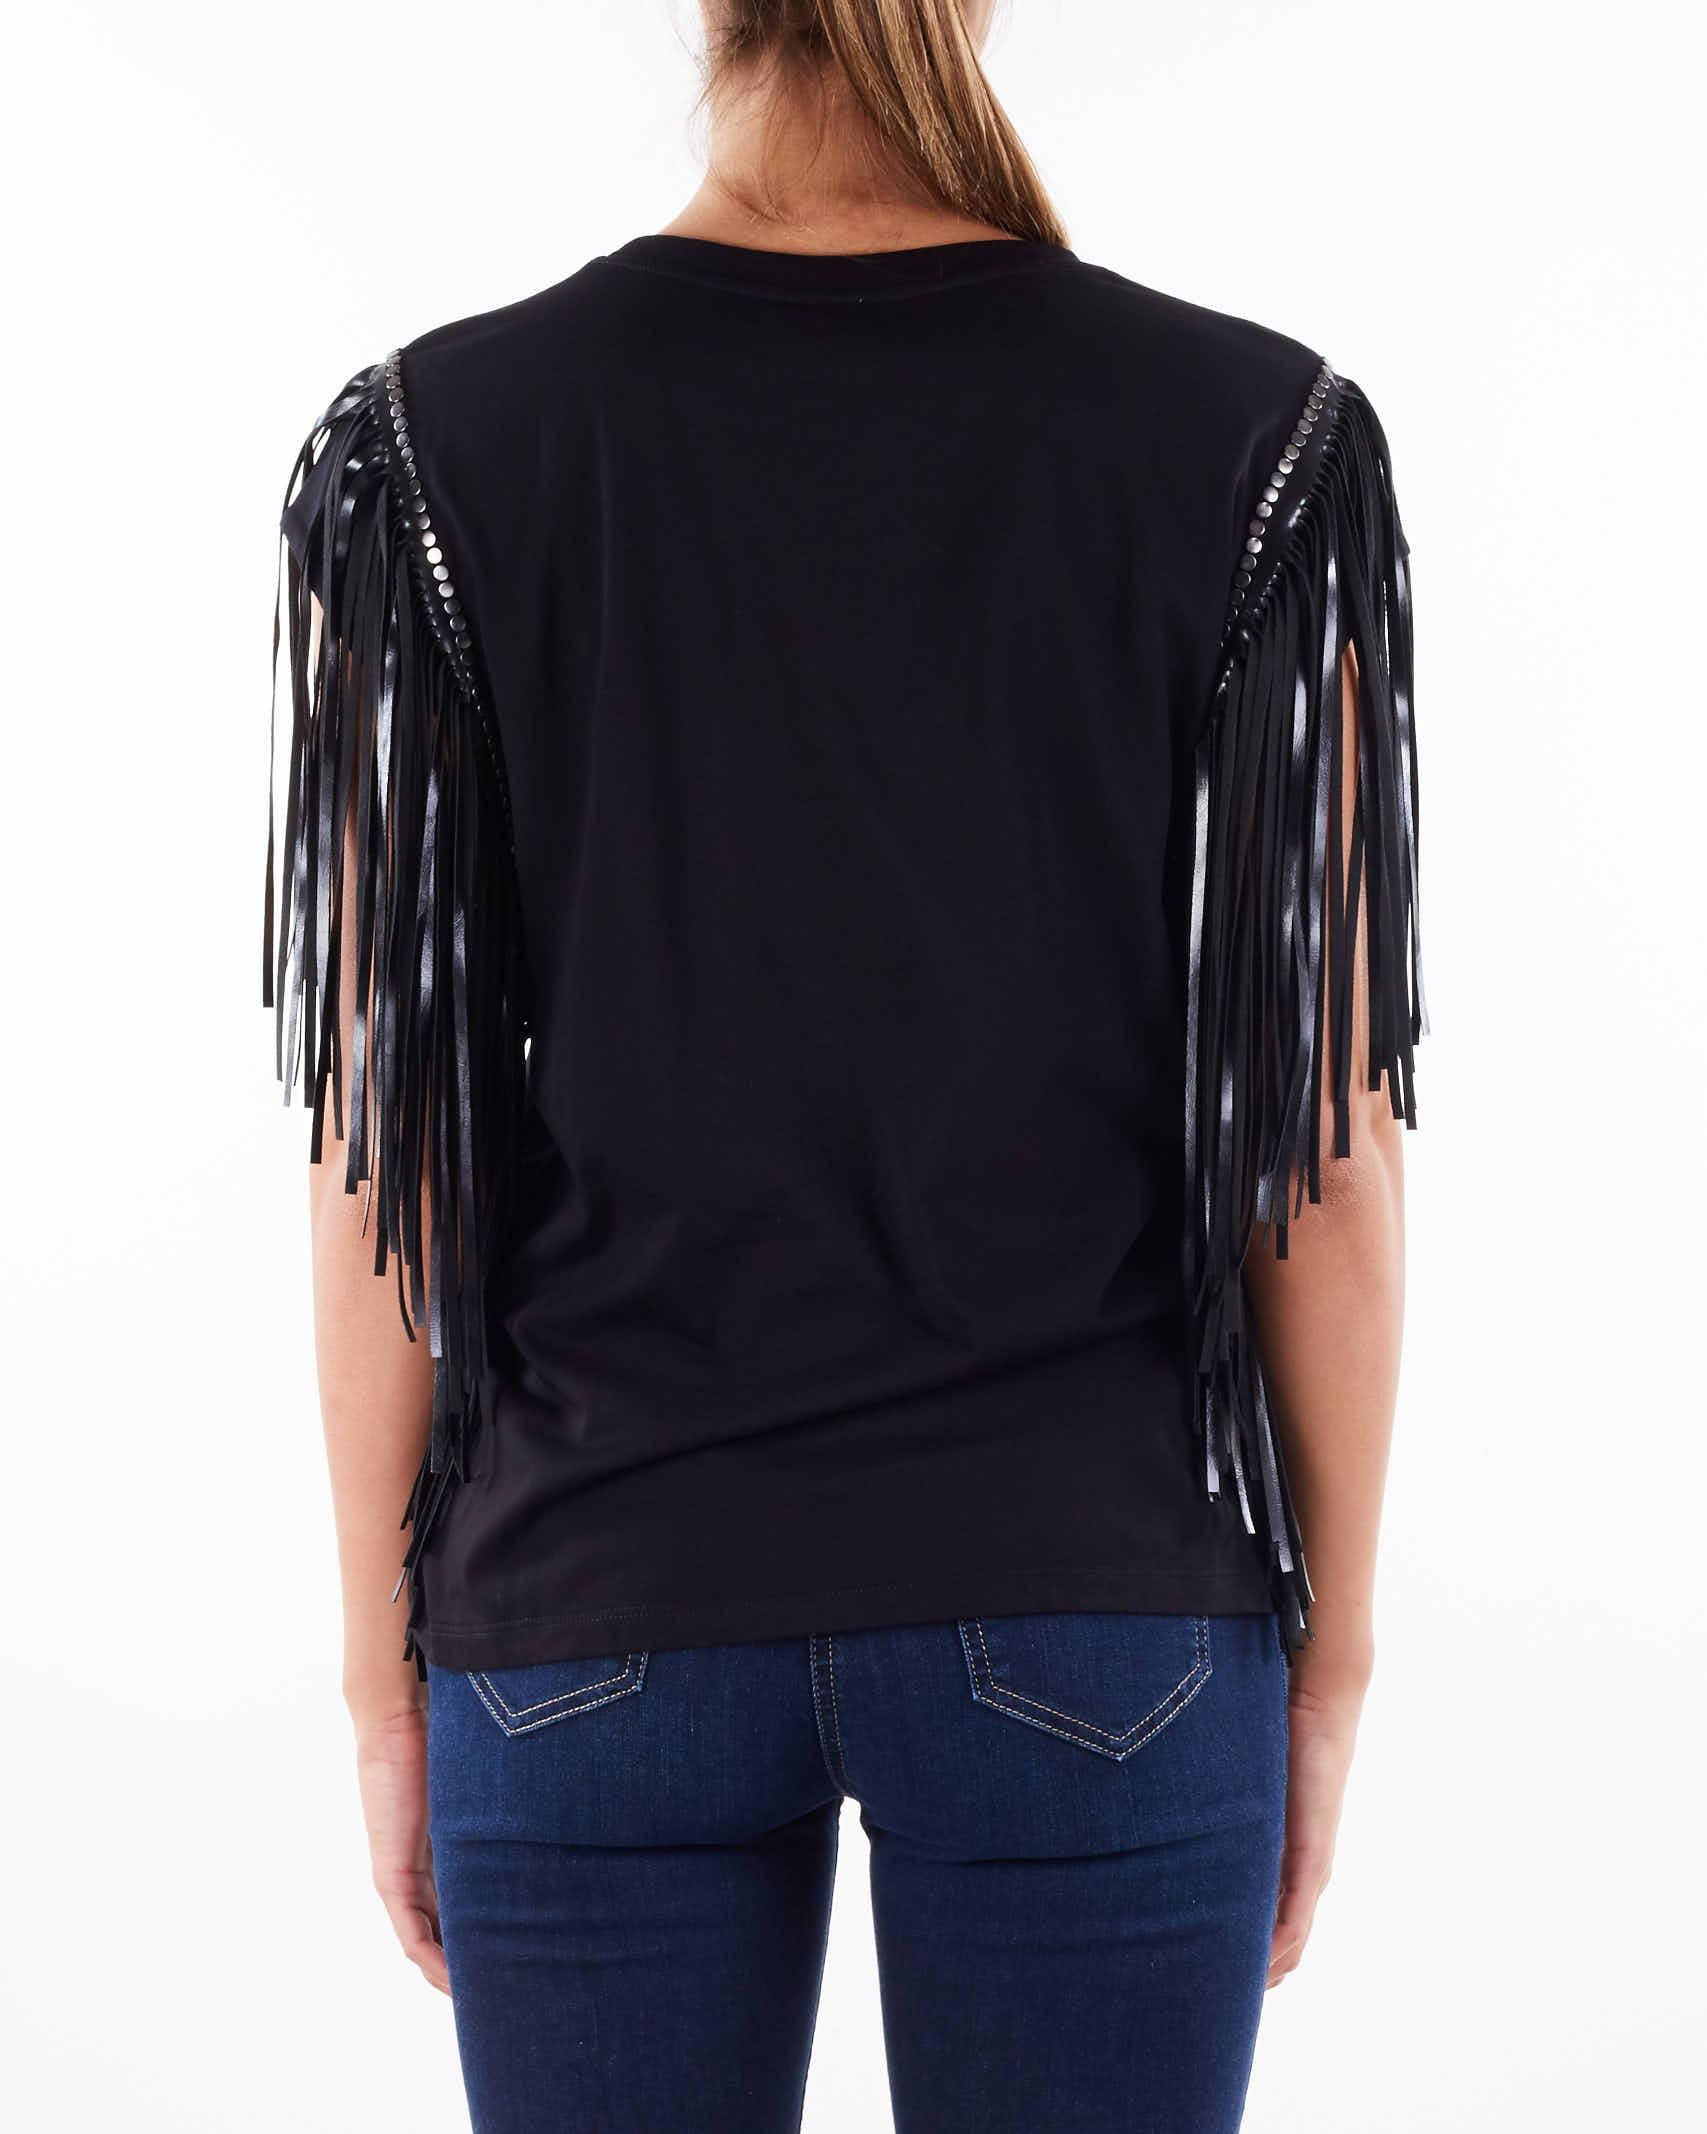 T-shirt Witch con stampa e frange Aniye By ANIYE BY   T-shirt   1812222